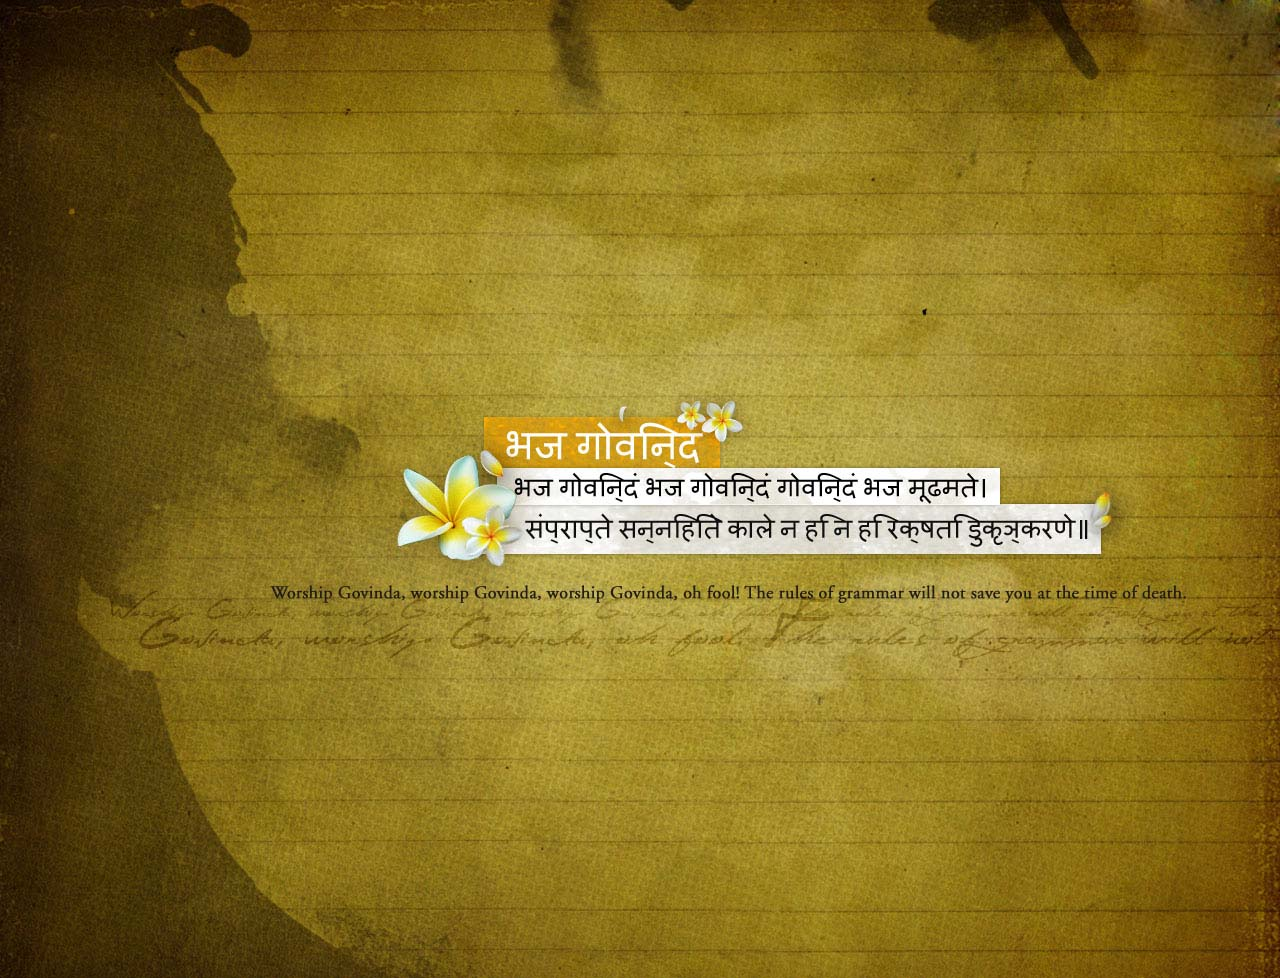 http://1.bp.blogspot.com/-Zti3EPrWcPY/T8EBm0-zMdI/AAAAAAAAIR0/2jqRkgw6zNM/s1600/Vedic+Mantras+Wallpapers.jpg